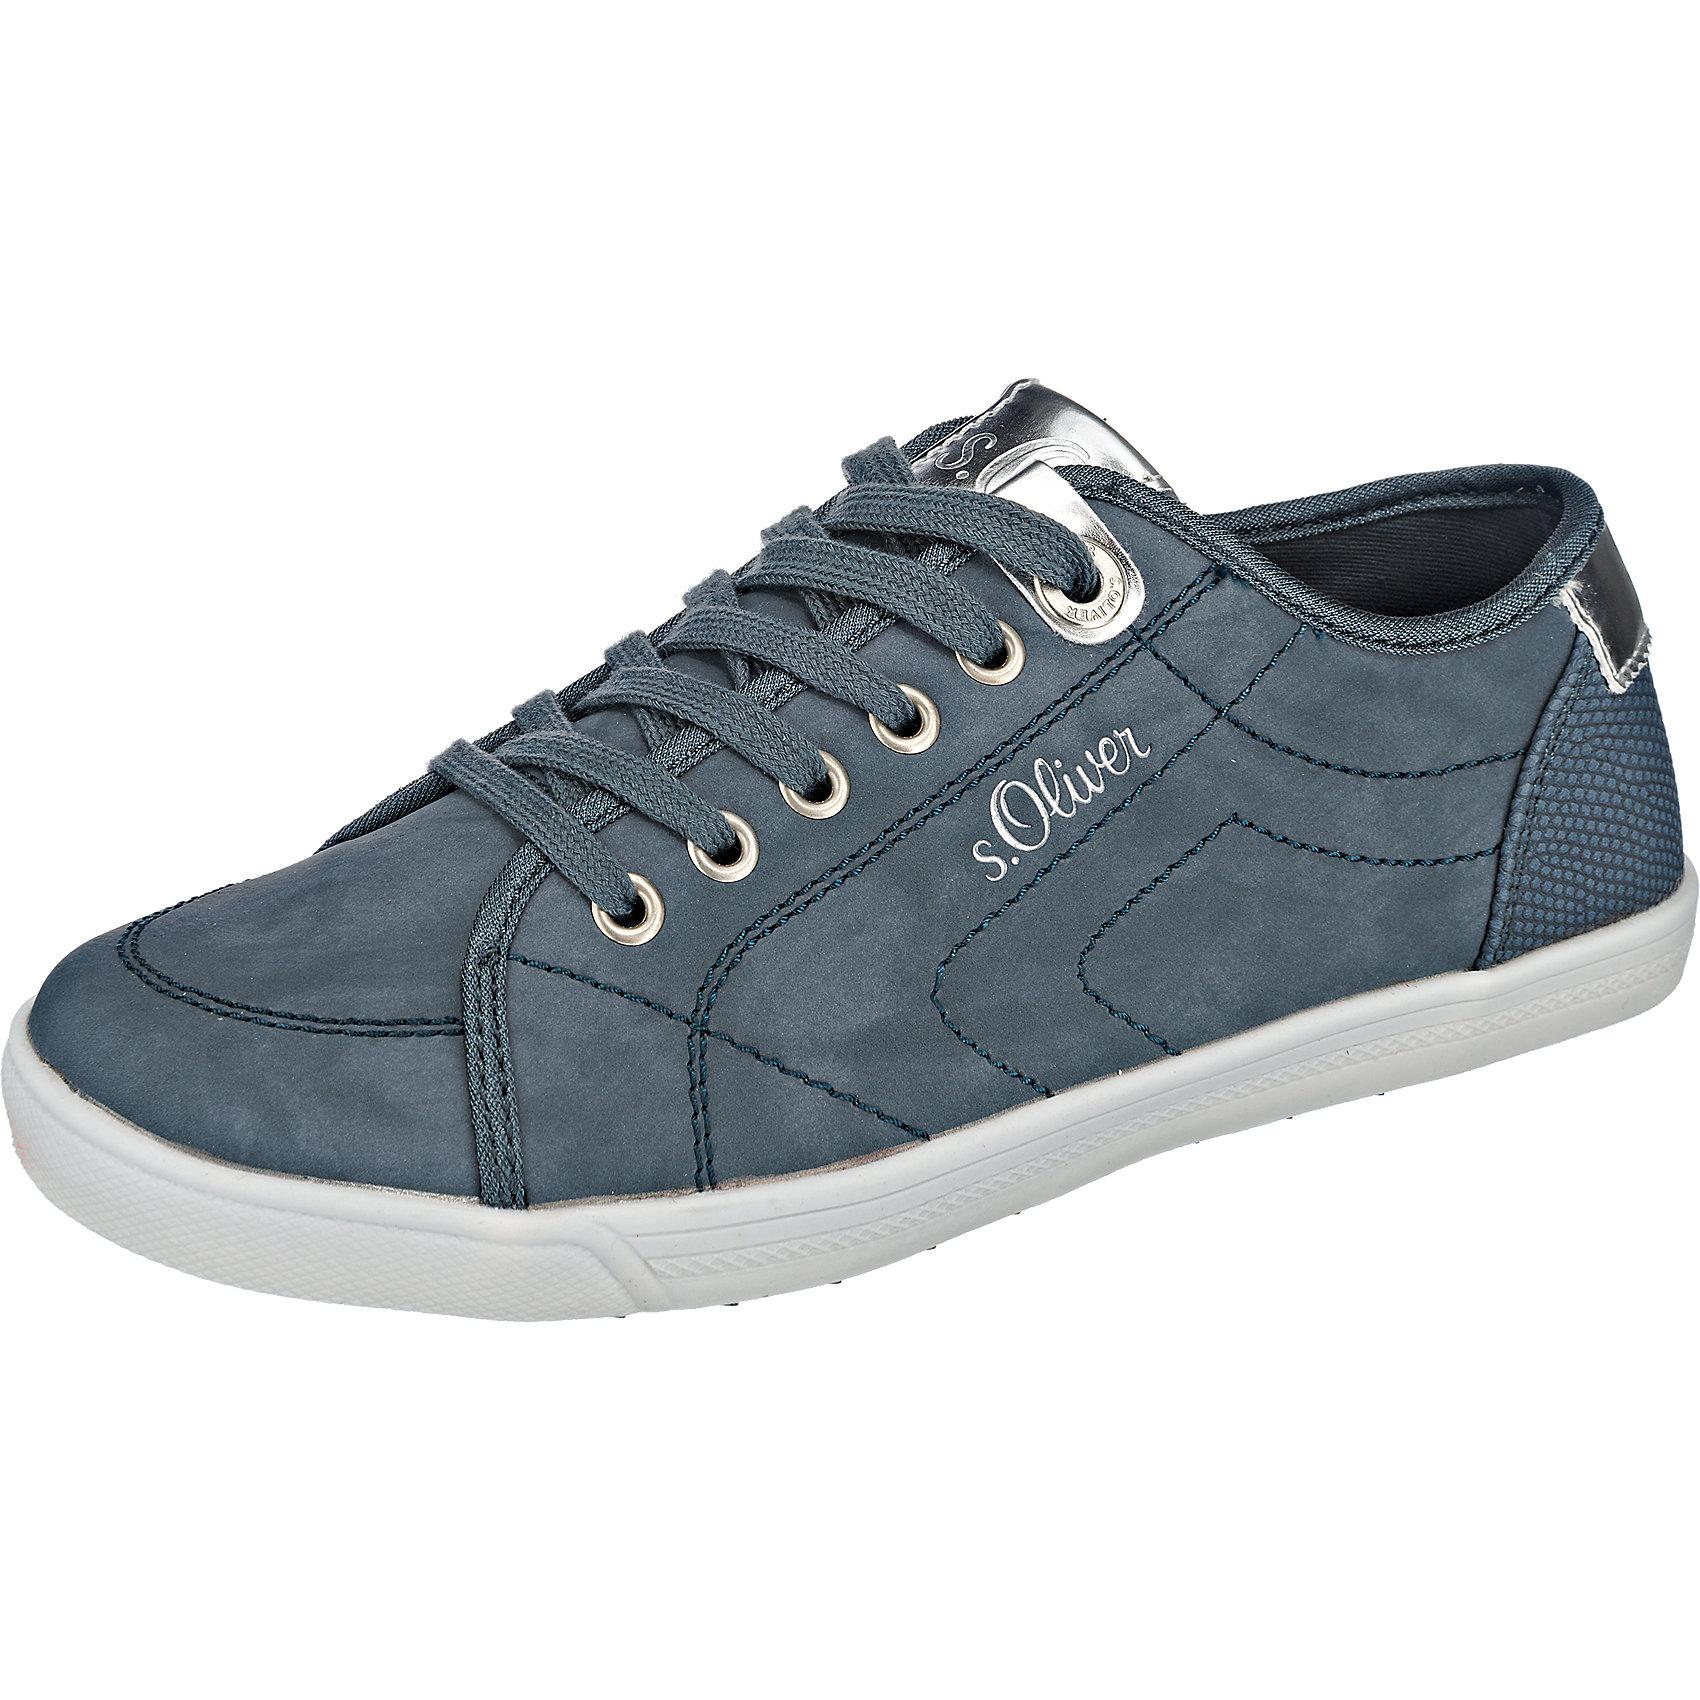 f5447b910401 Mens Nike KOBE A.D. Basketball Shoes